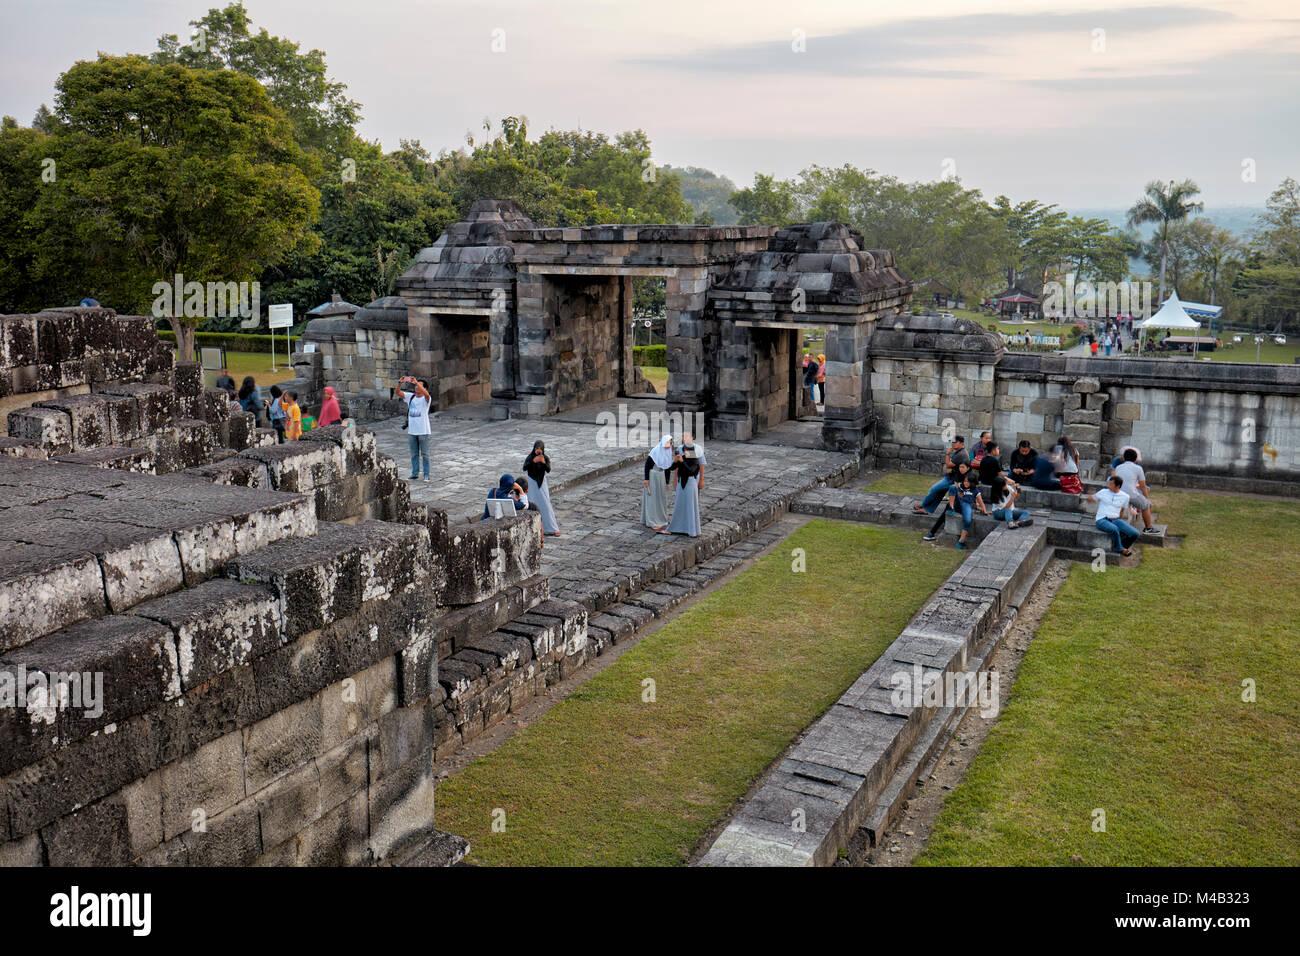 The main gate of Ratu Boko Palace compound at sunset. Special Region of Yogyakarta, Java, Indonesia. - Stock Image